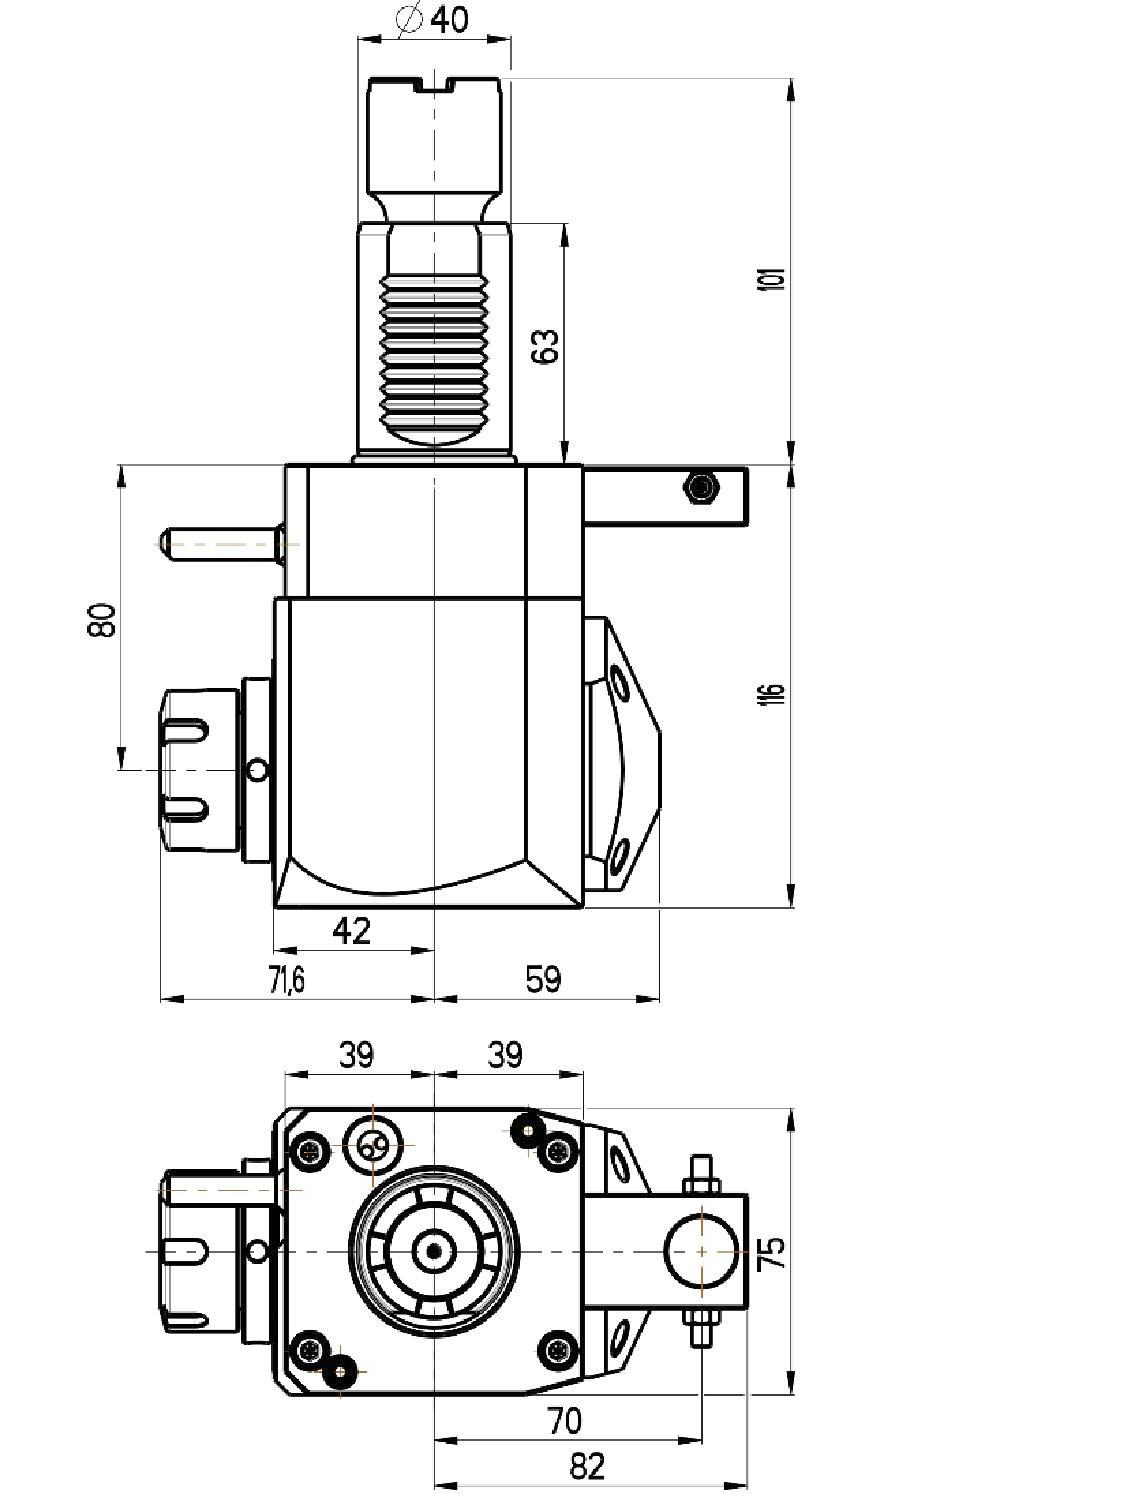 vdi 40 winkliger werkzeughalter kupplung gestuft ohne innenk hlung. Black Bedroom Furniture Sets. Home Design Ideas